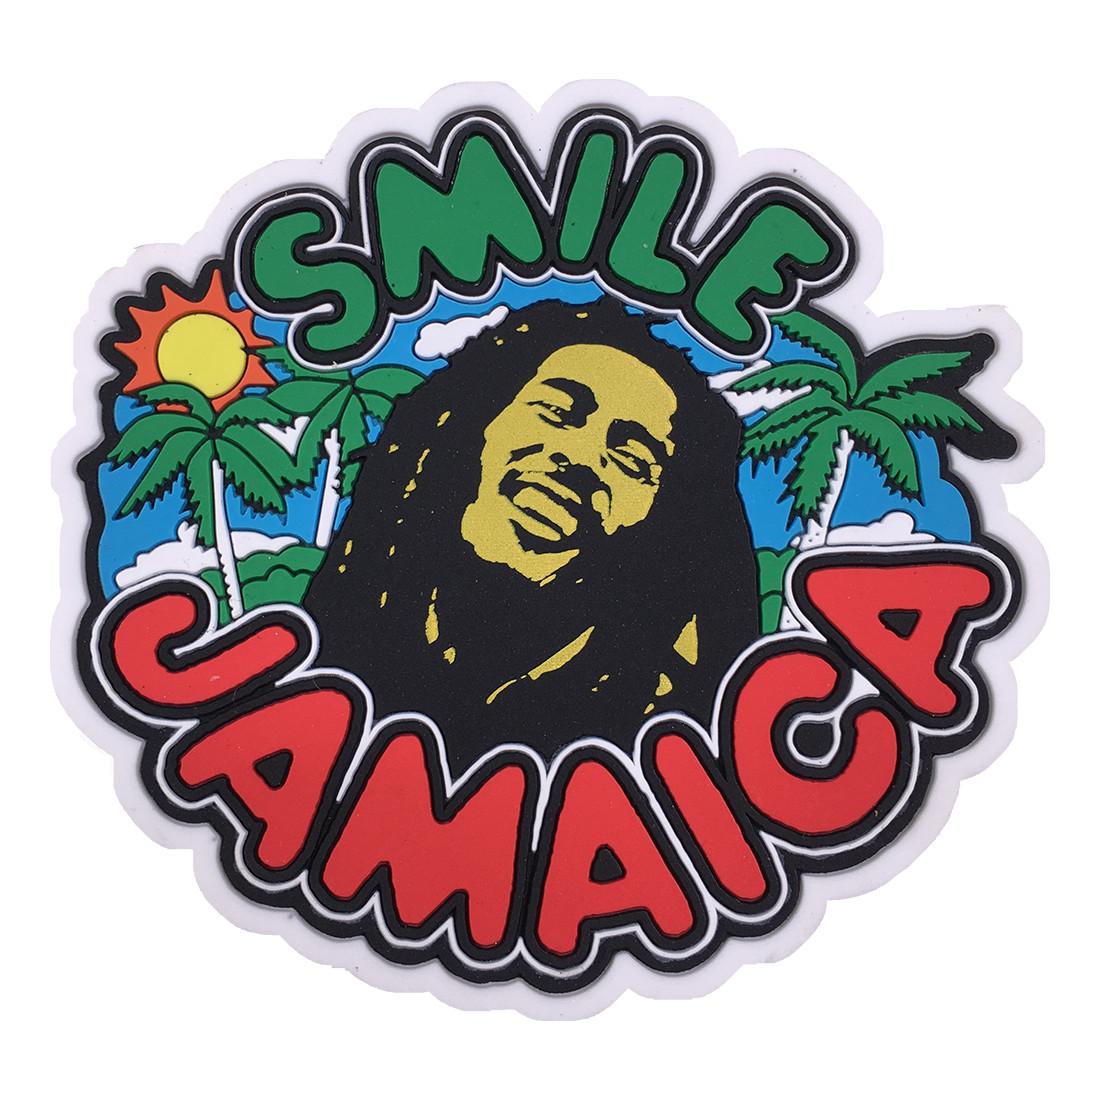 Marley Smile Jamaica Magnet